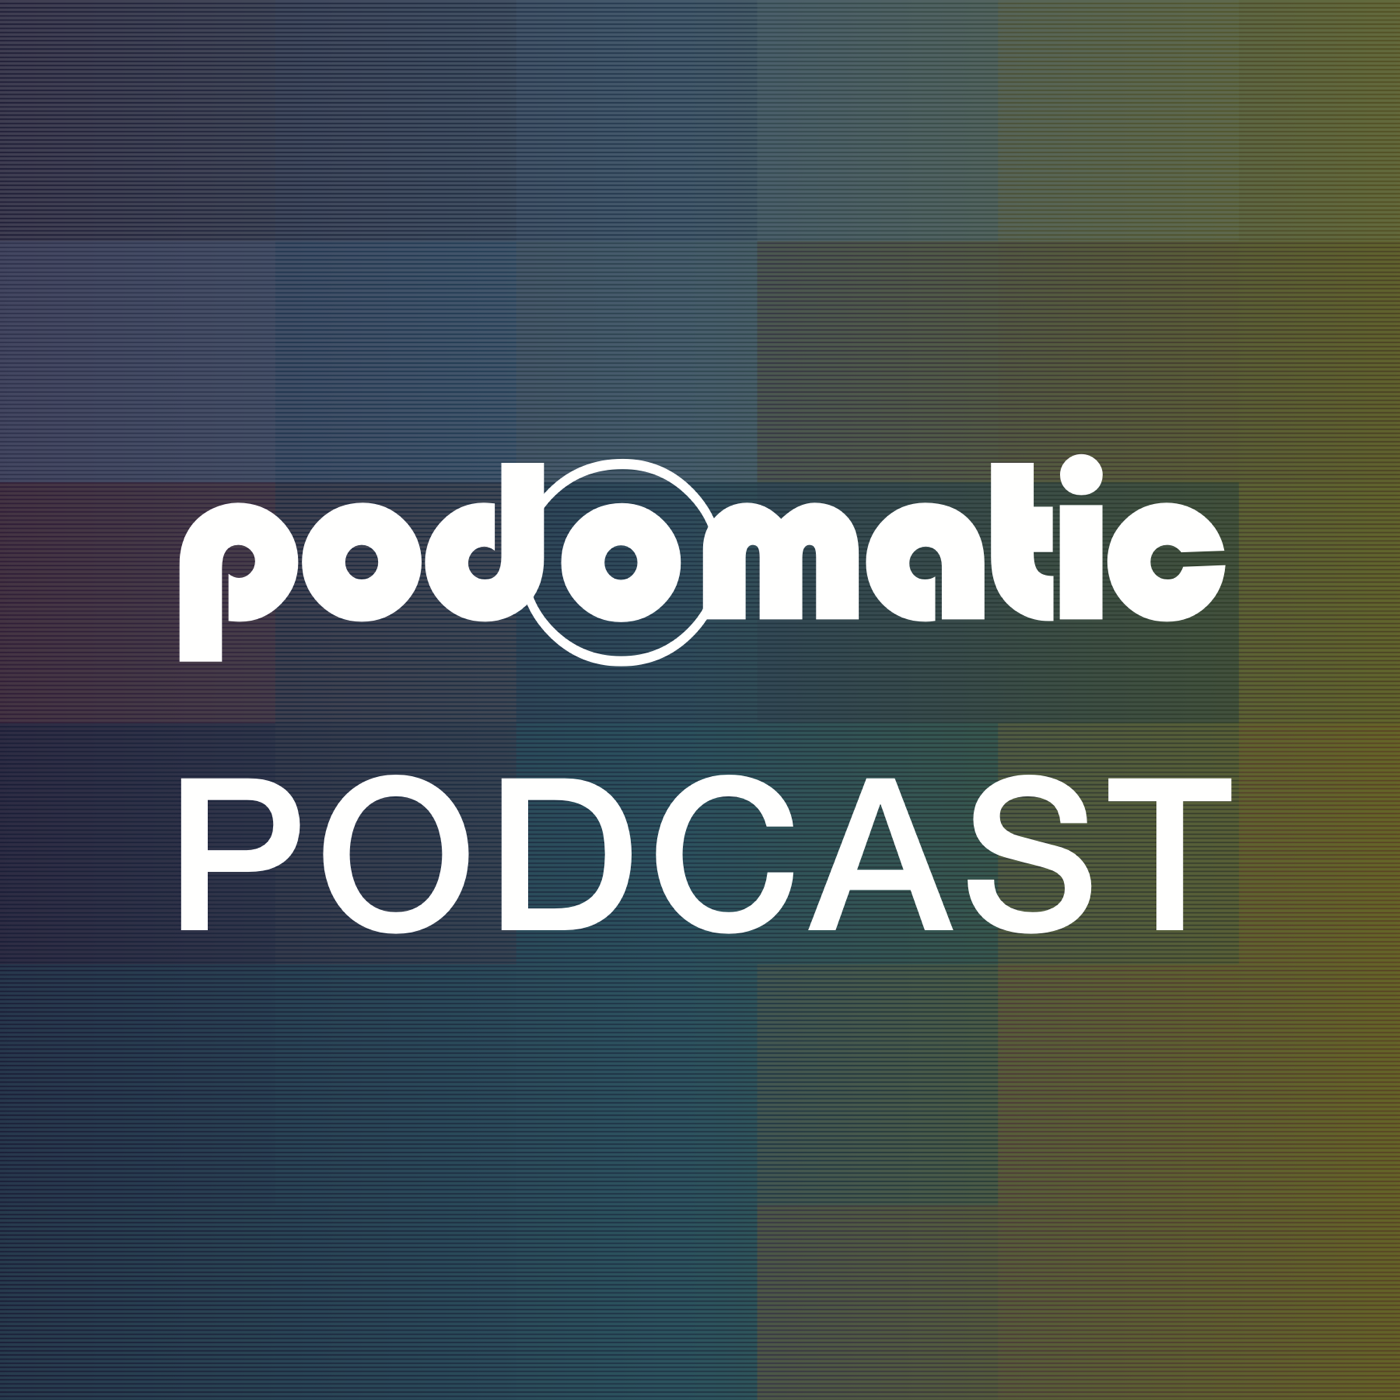 baltoist's Podcast